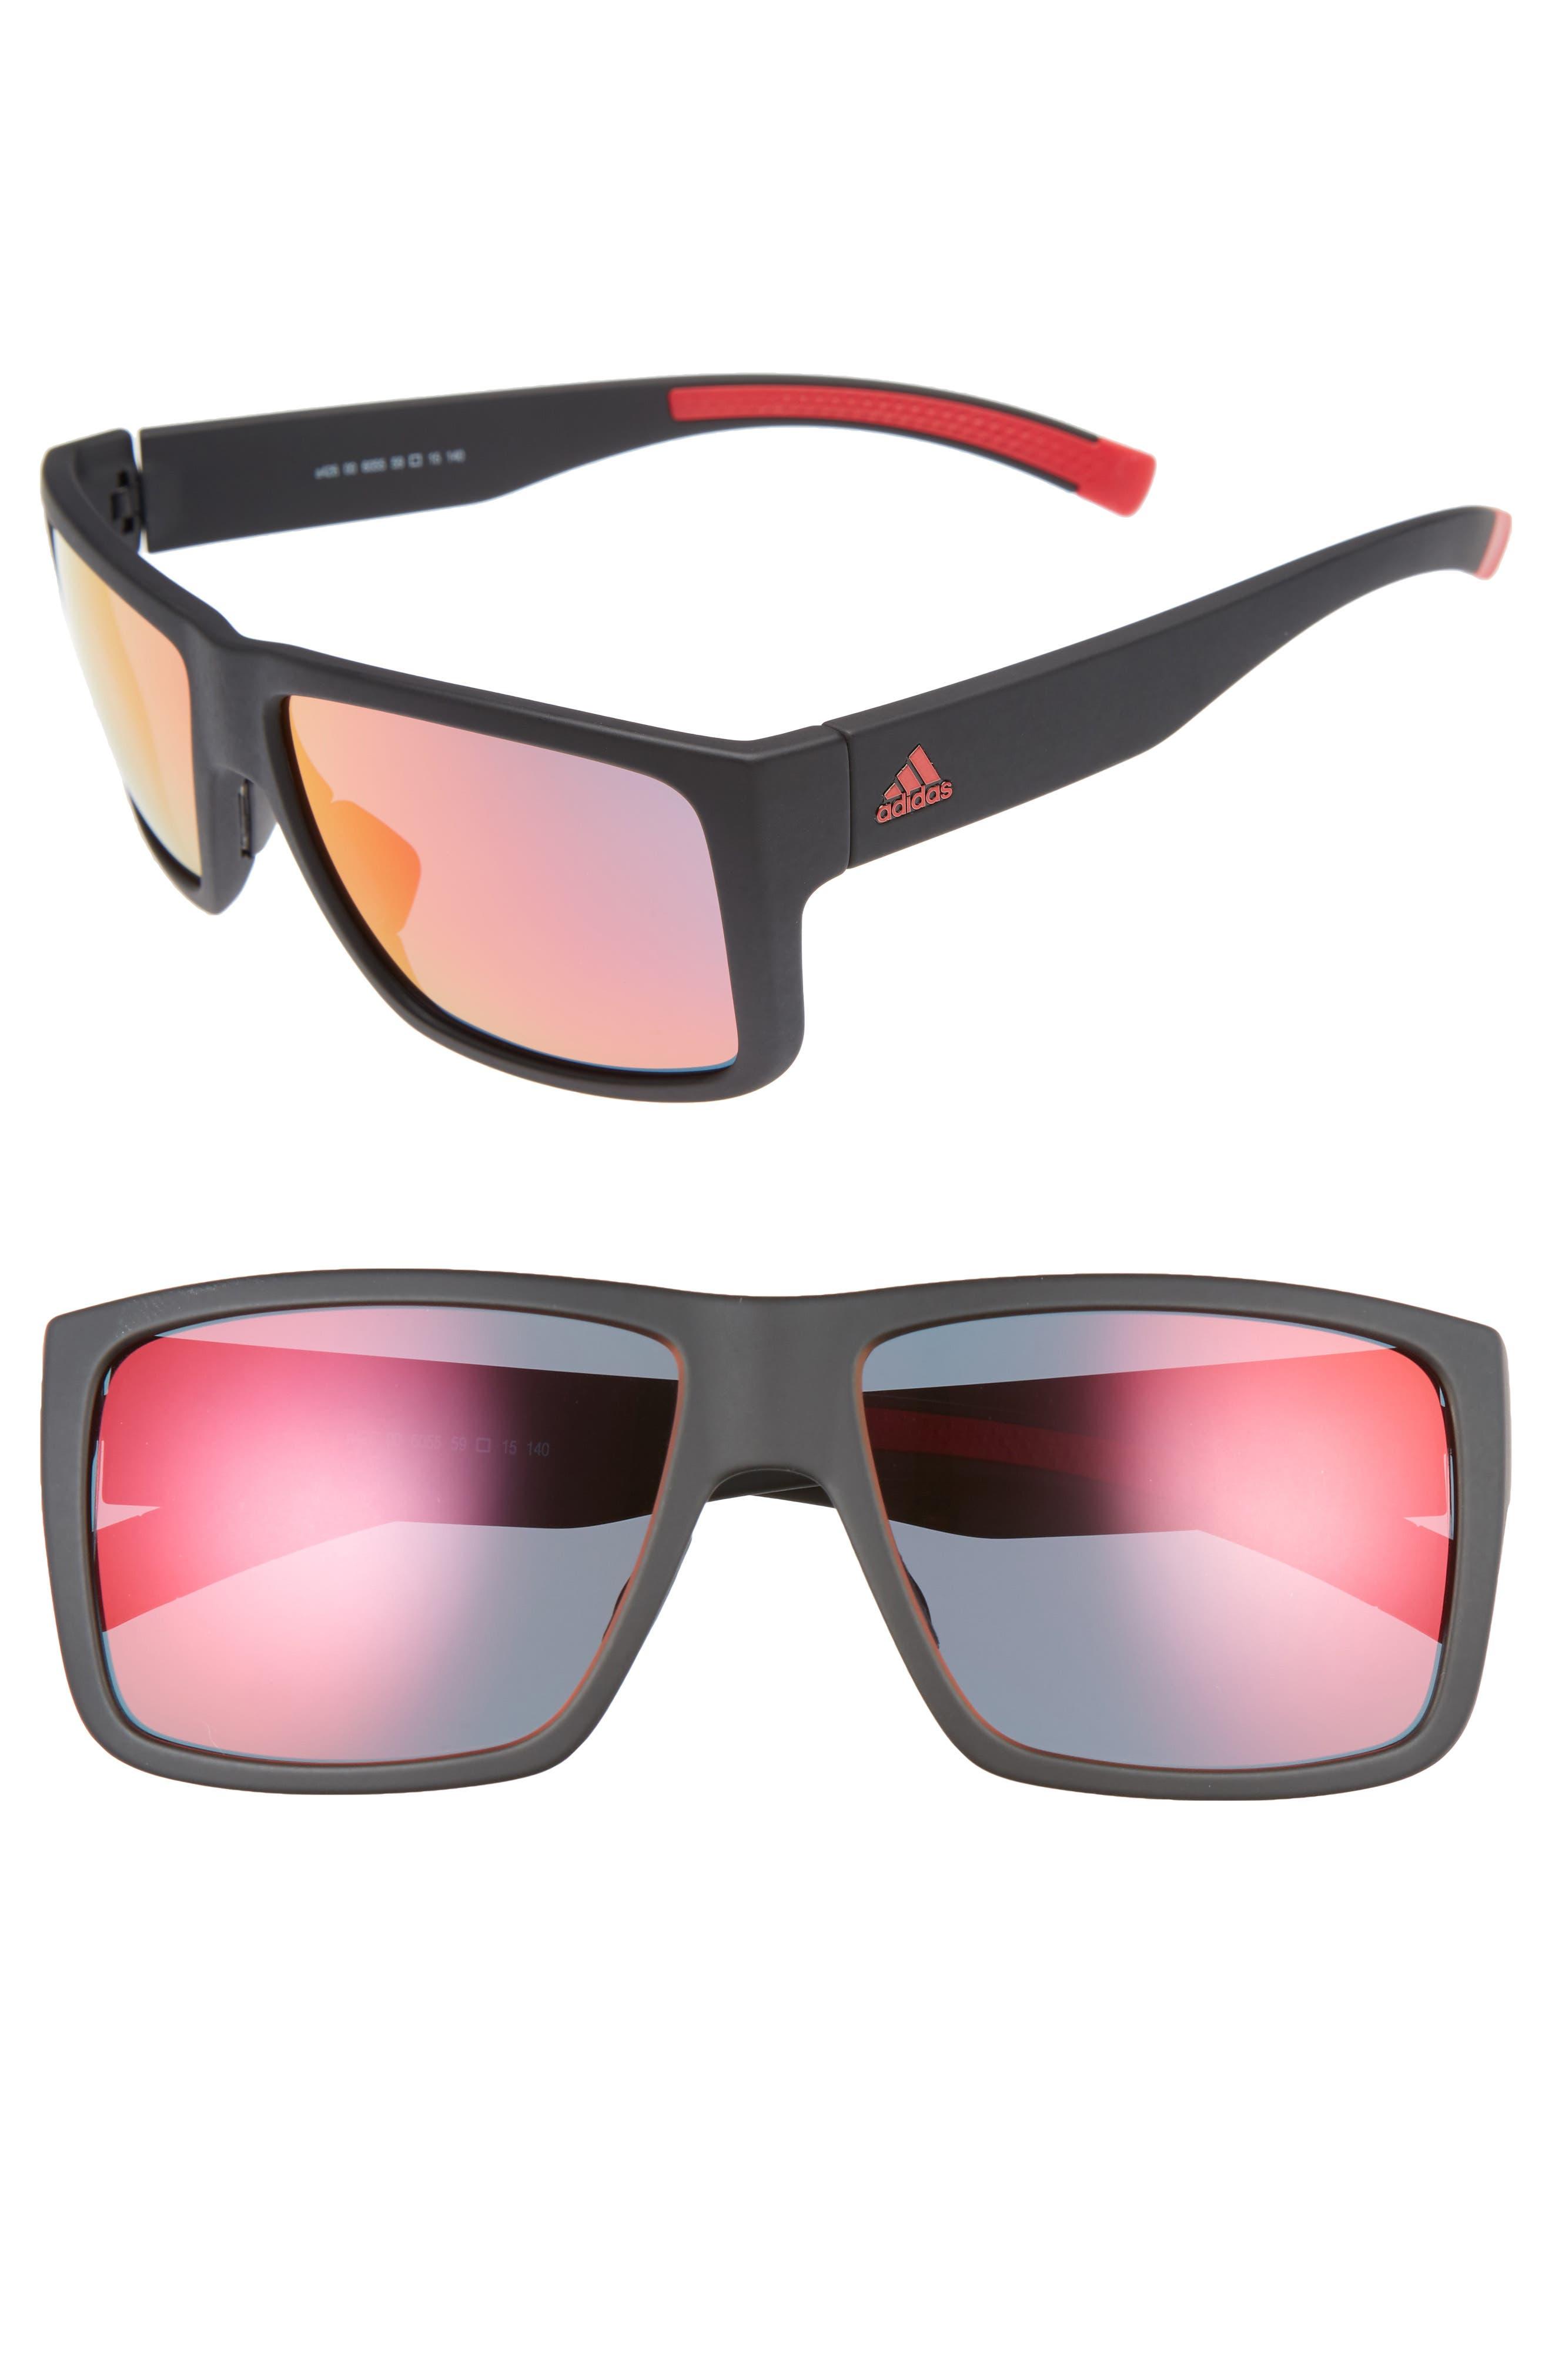 Matic 59mm Sunglasses,                             Alternate thumbnail 3, color,                             BLACK MATTE/ RED MIRROR